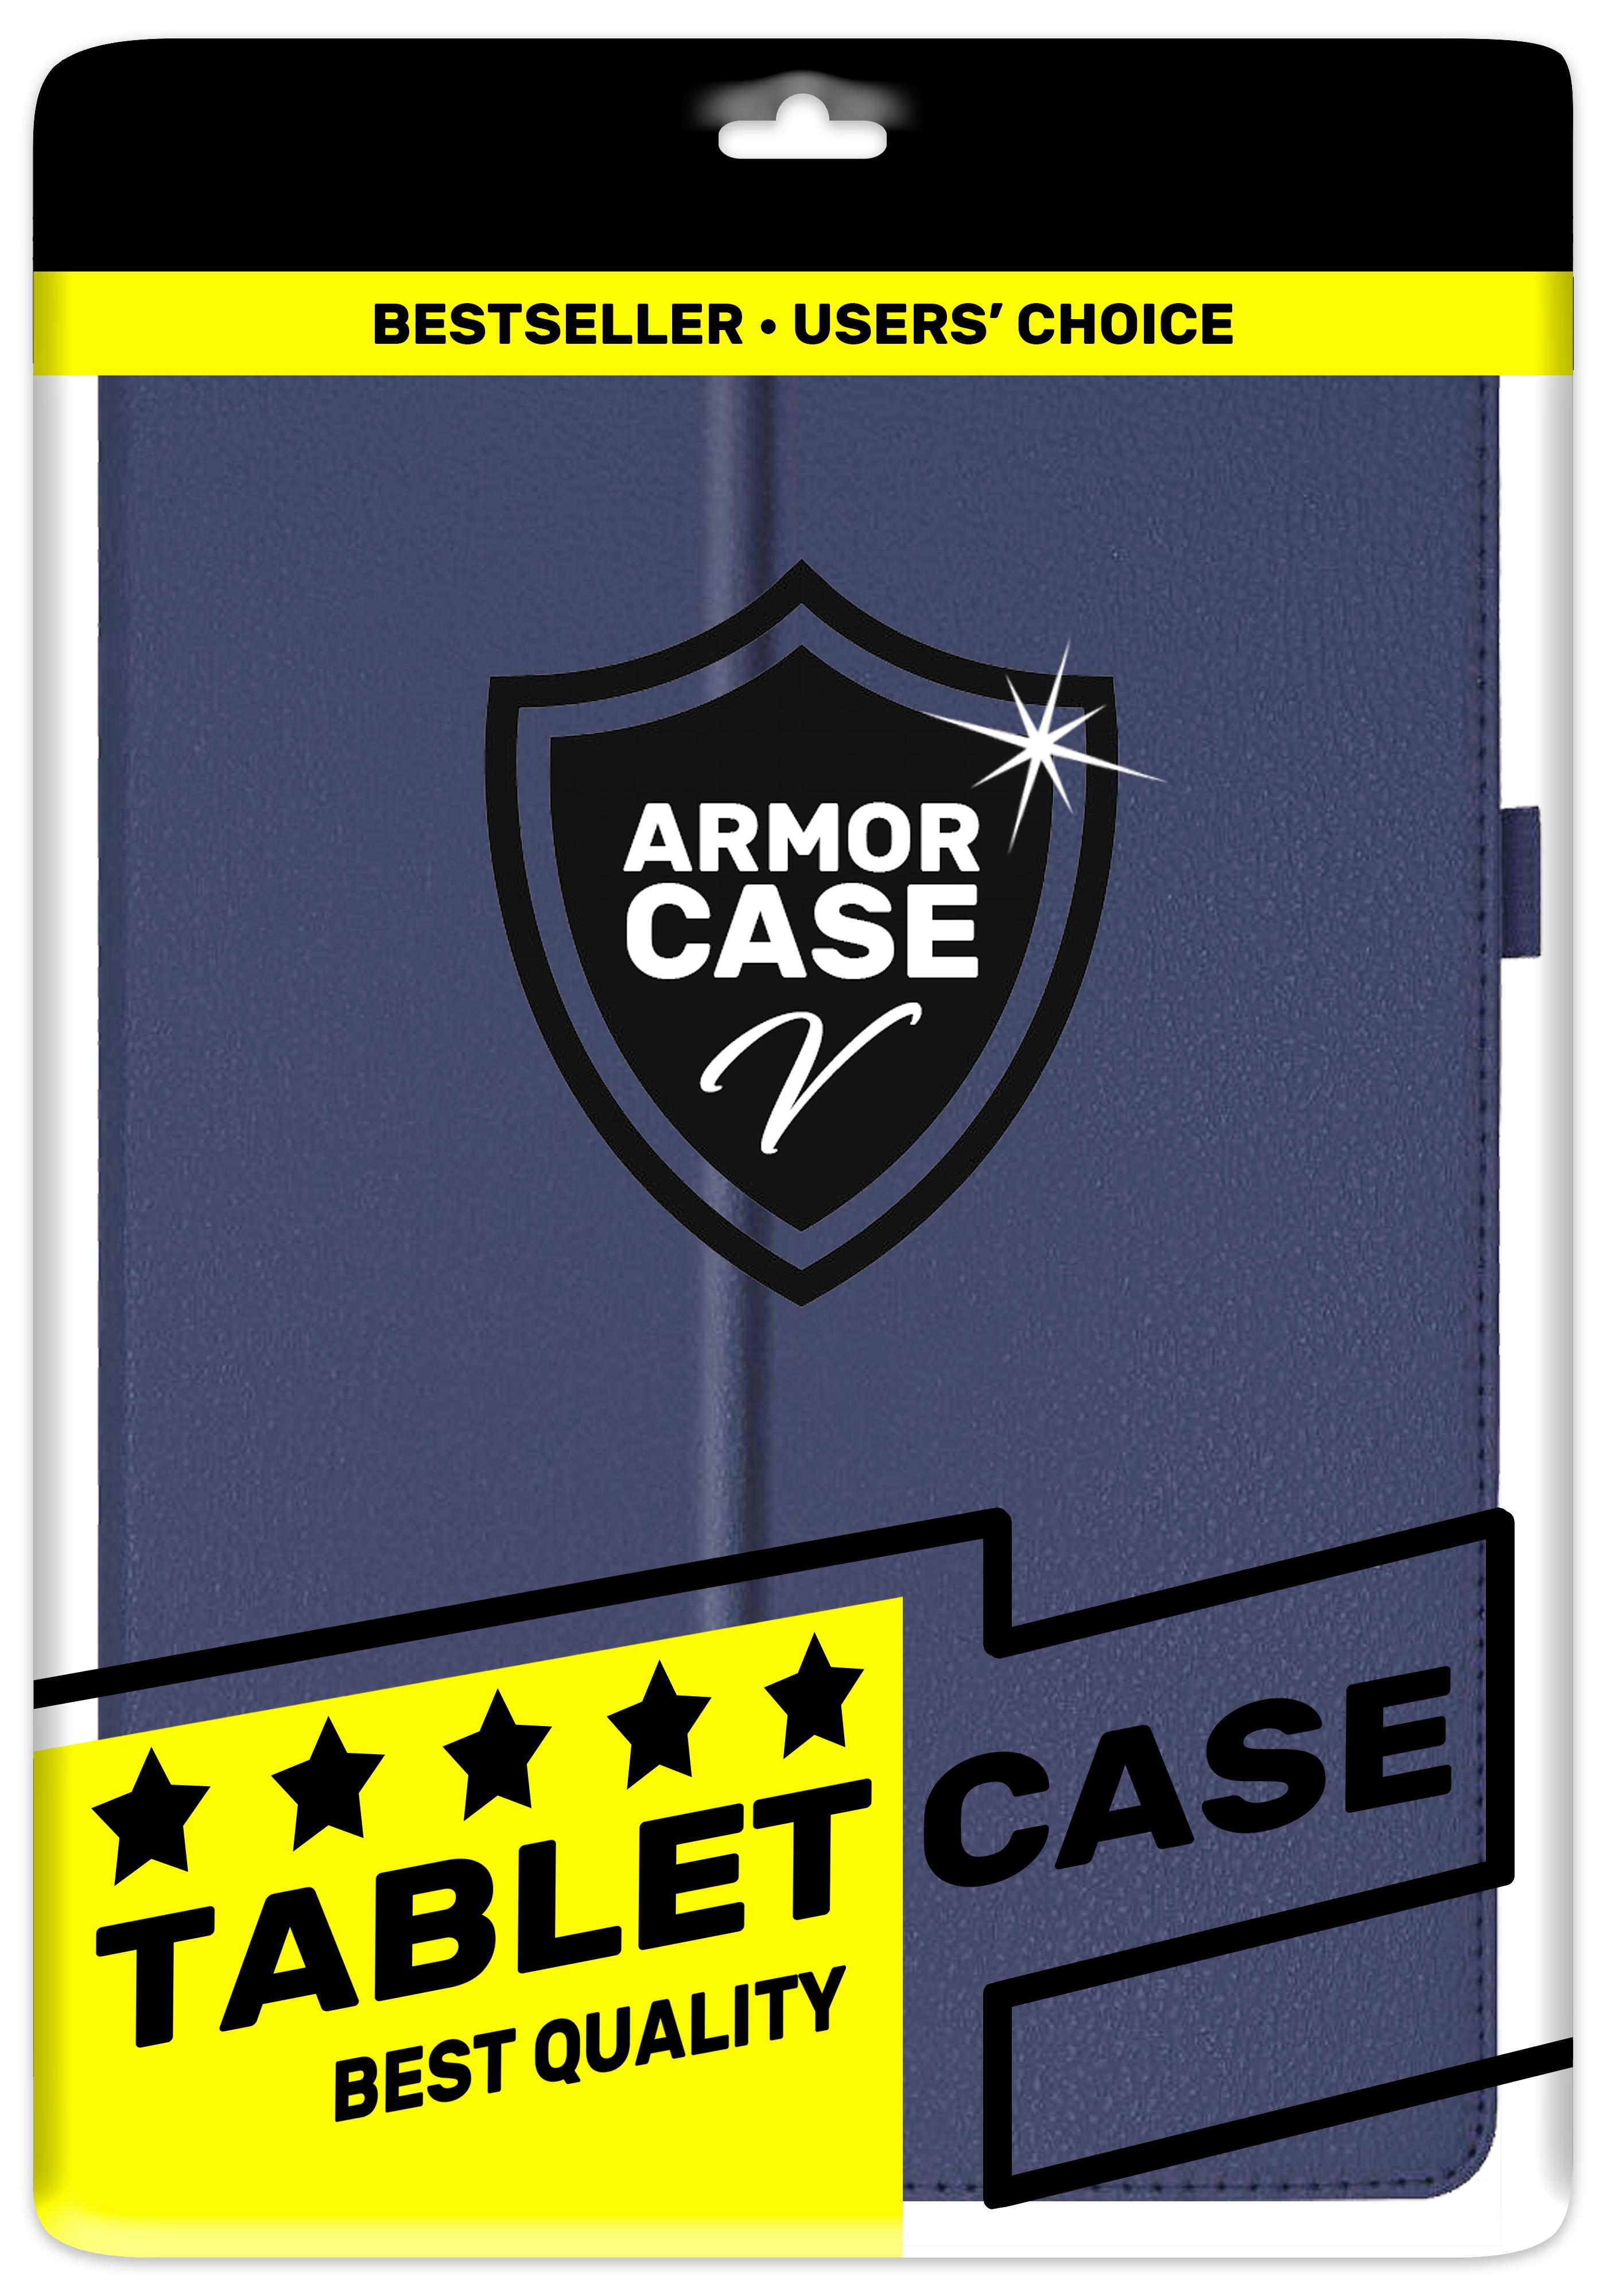 PouzdroTab skládací pouzdro pro Lenovo Tab M10 FHD Plus 10.3 TB-X606F/L TB-X606X 5903802410129 Barva: Modrá